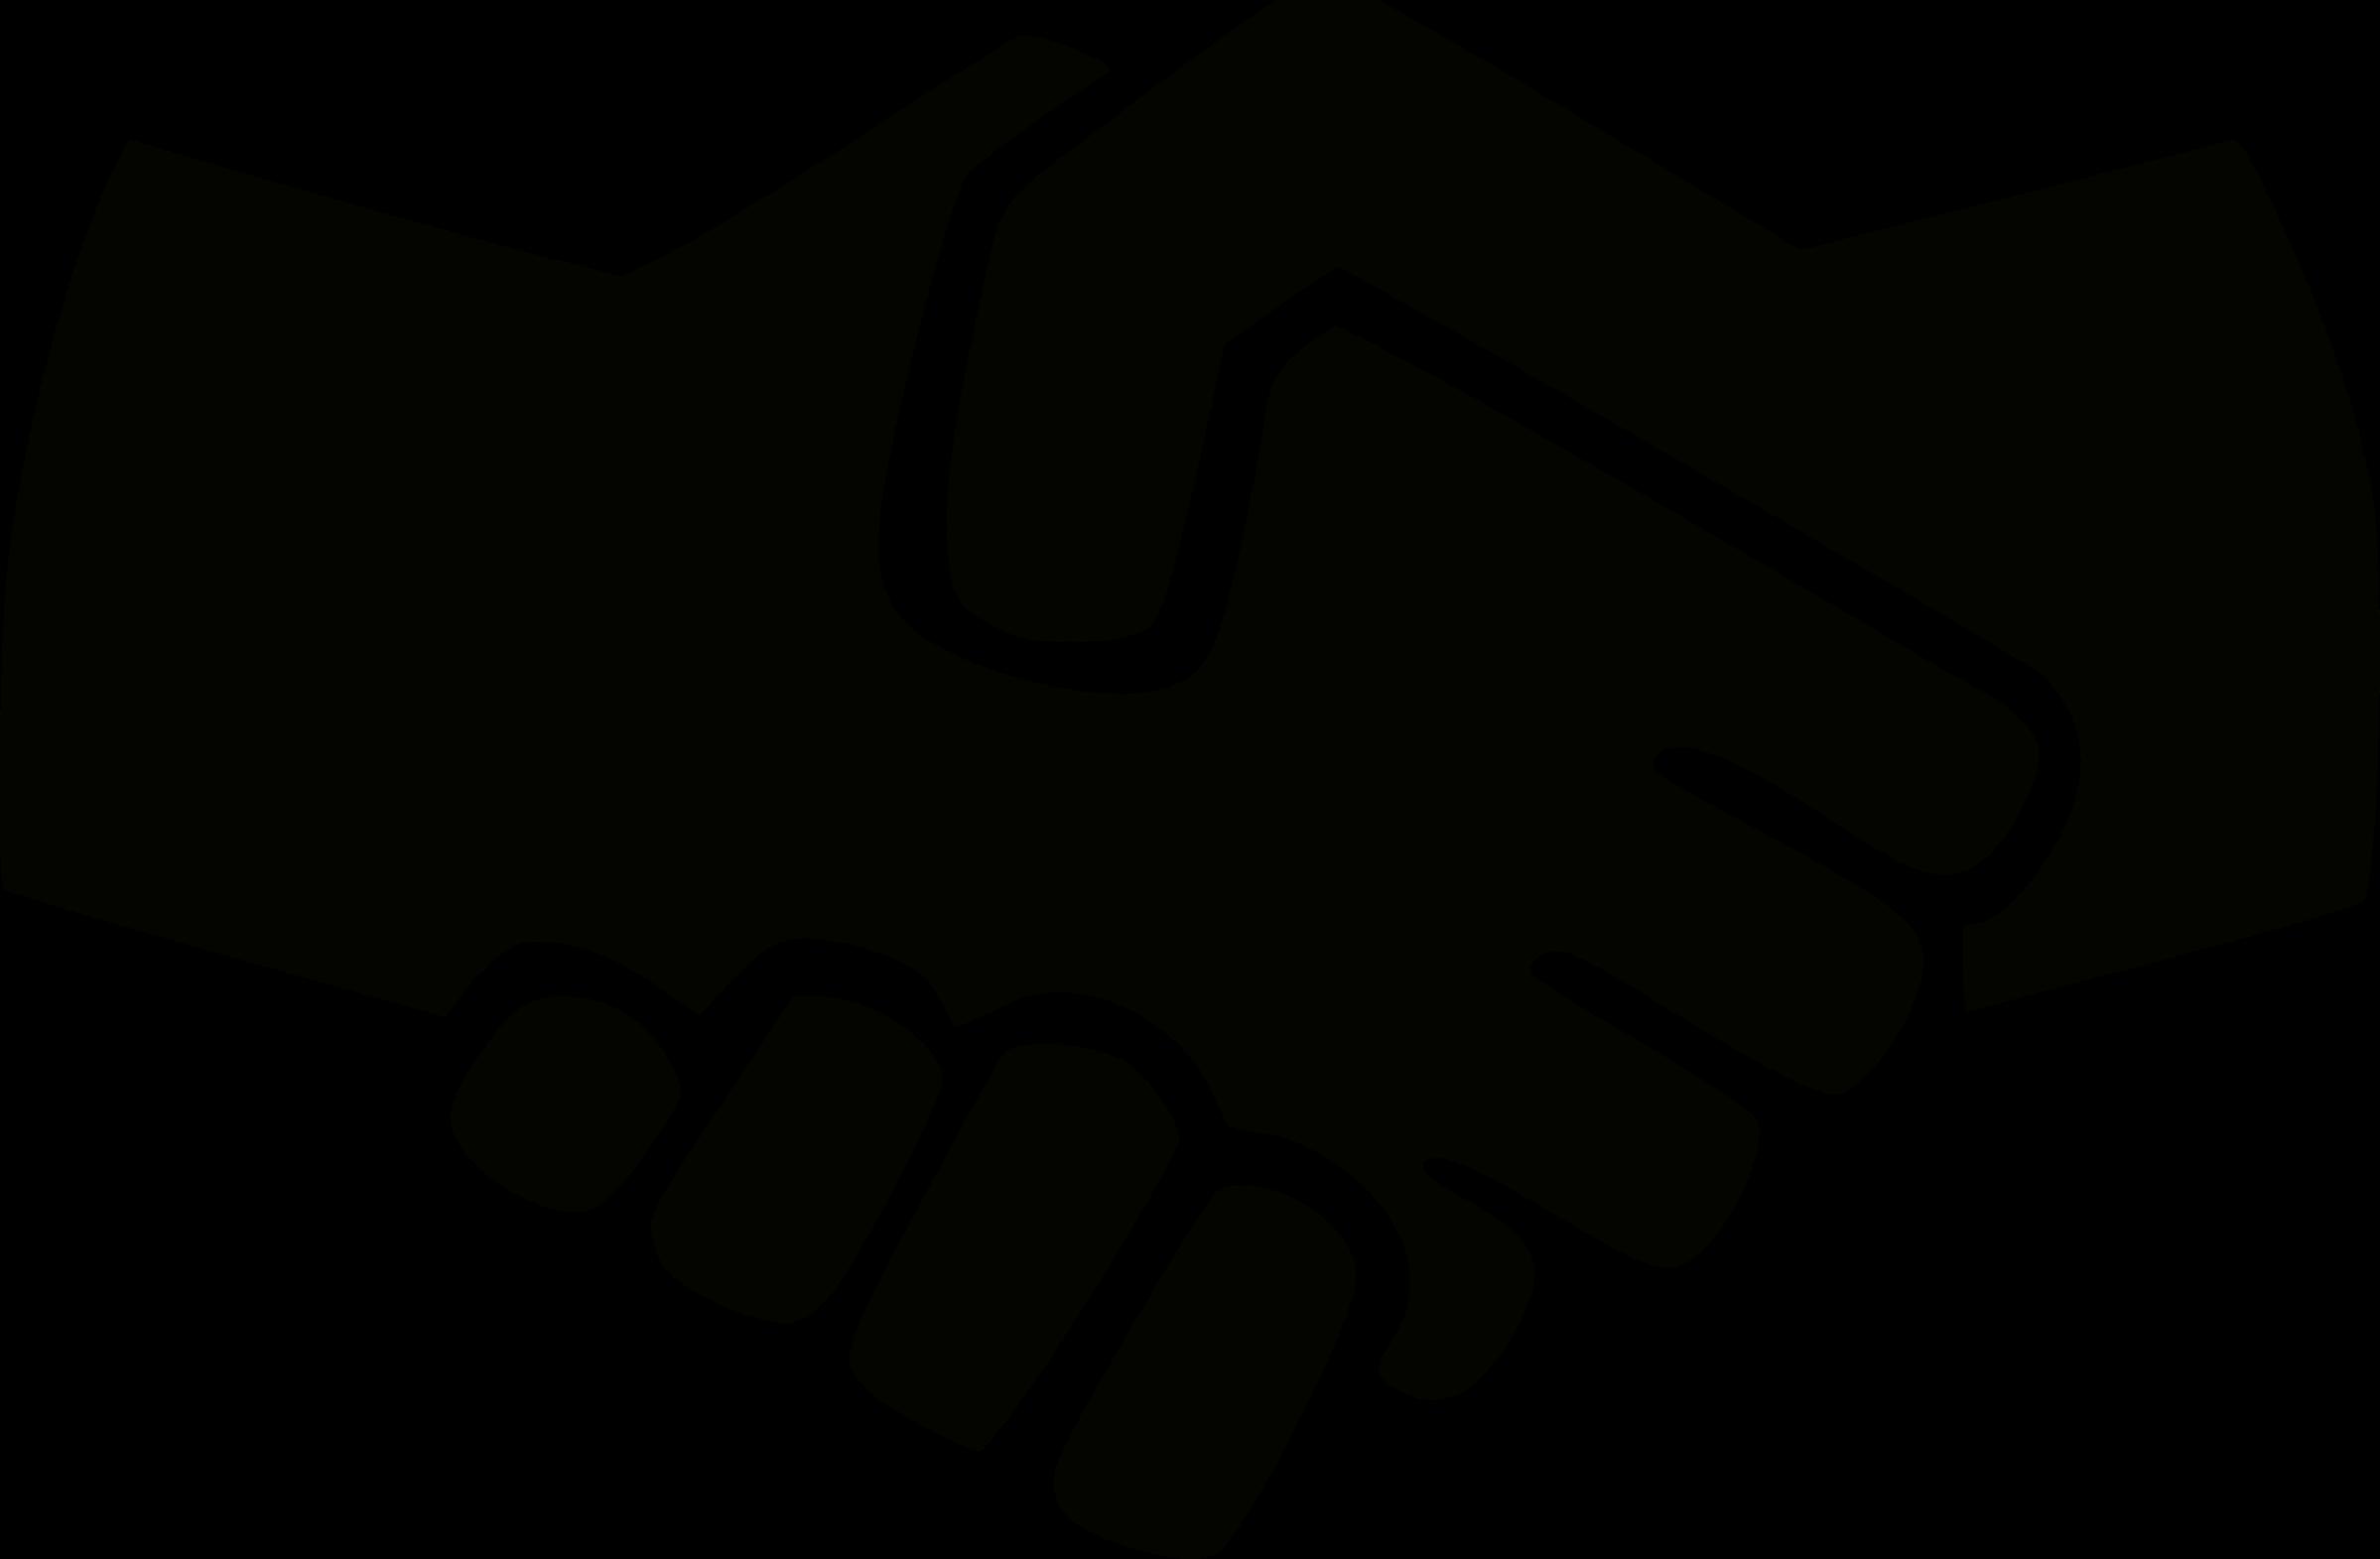 Black and white big. Handshake clipart outline